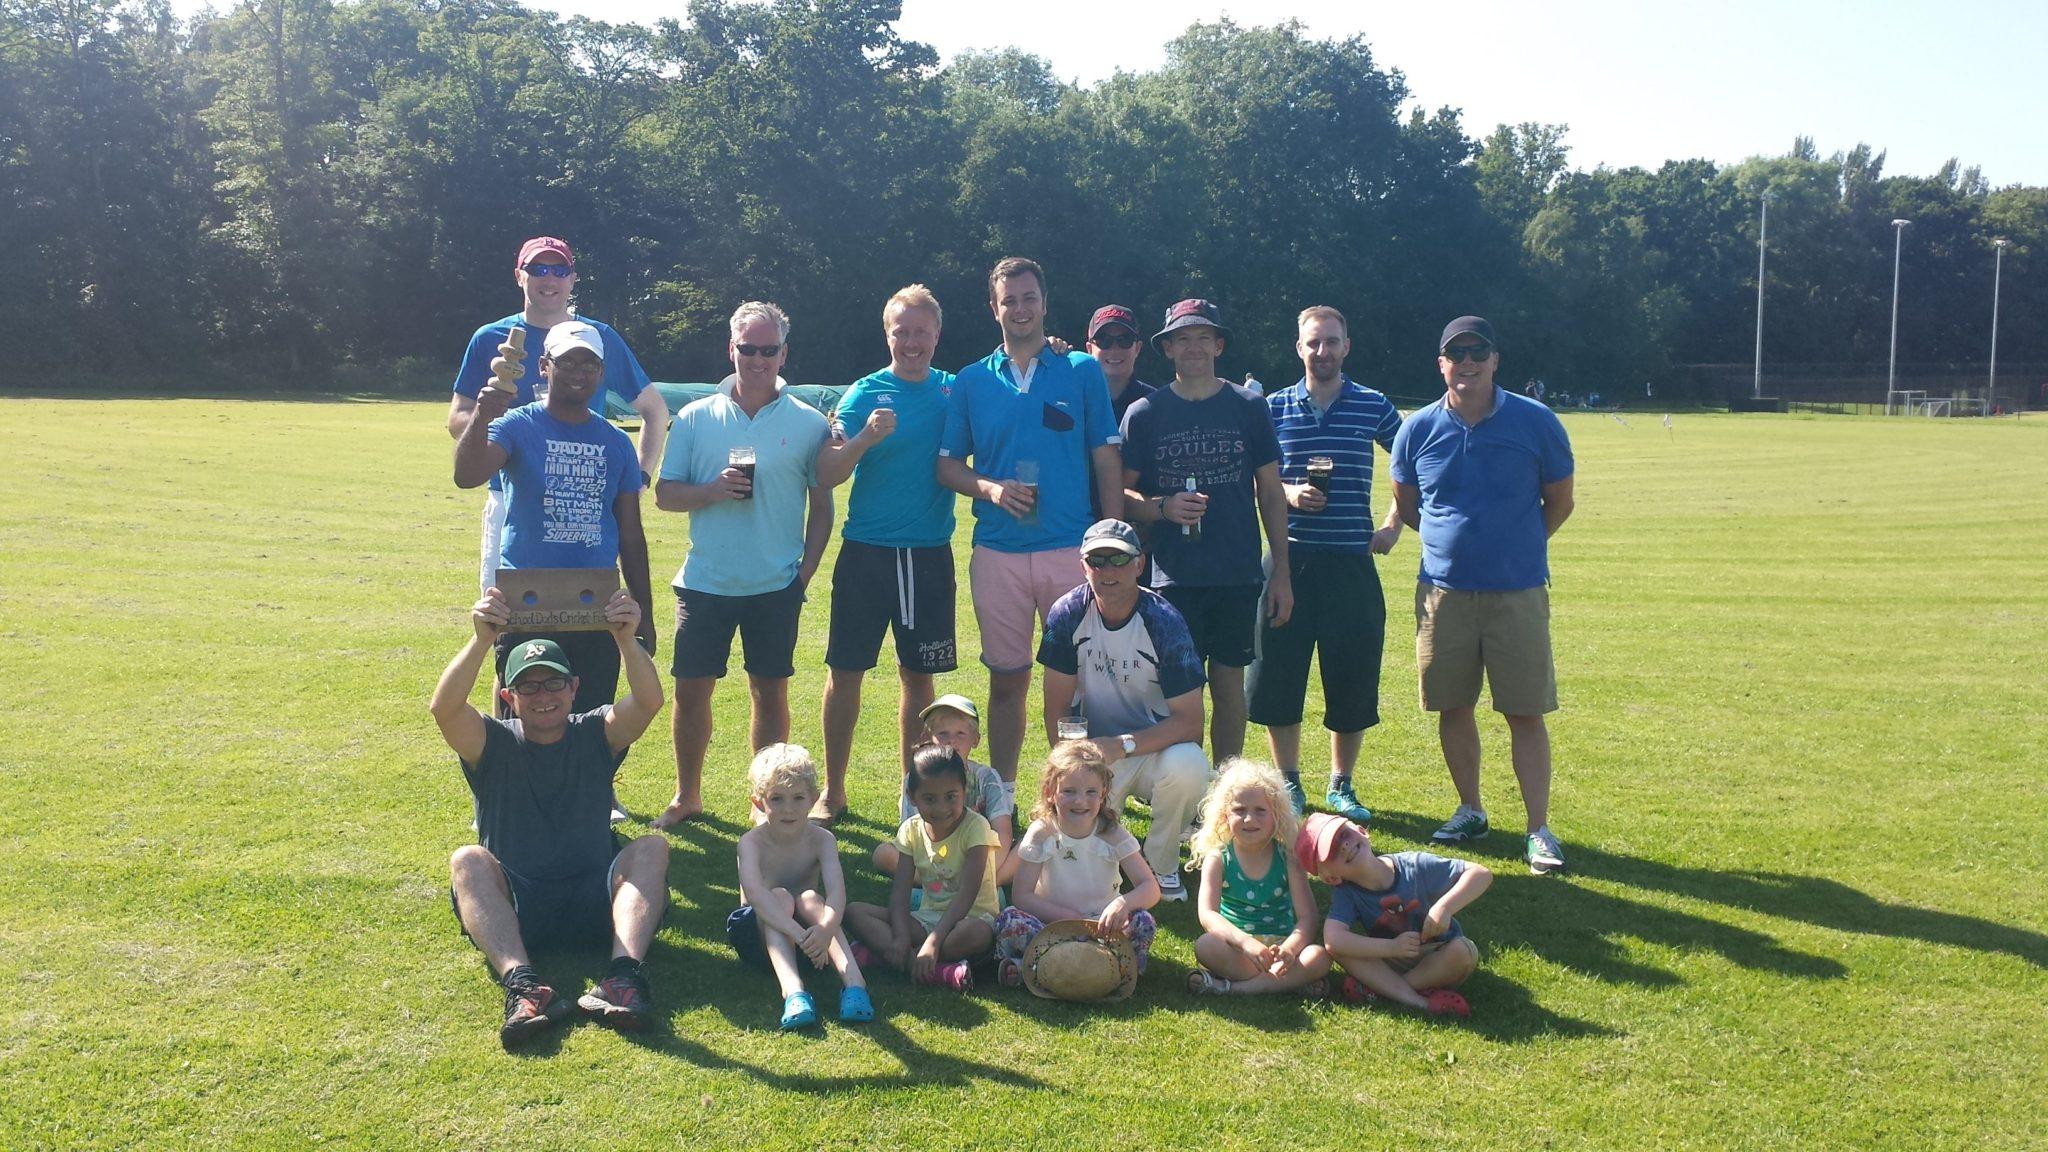 DADSVDADS Winning Team Photo Berkswell @DADSVDADS.COM